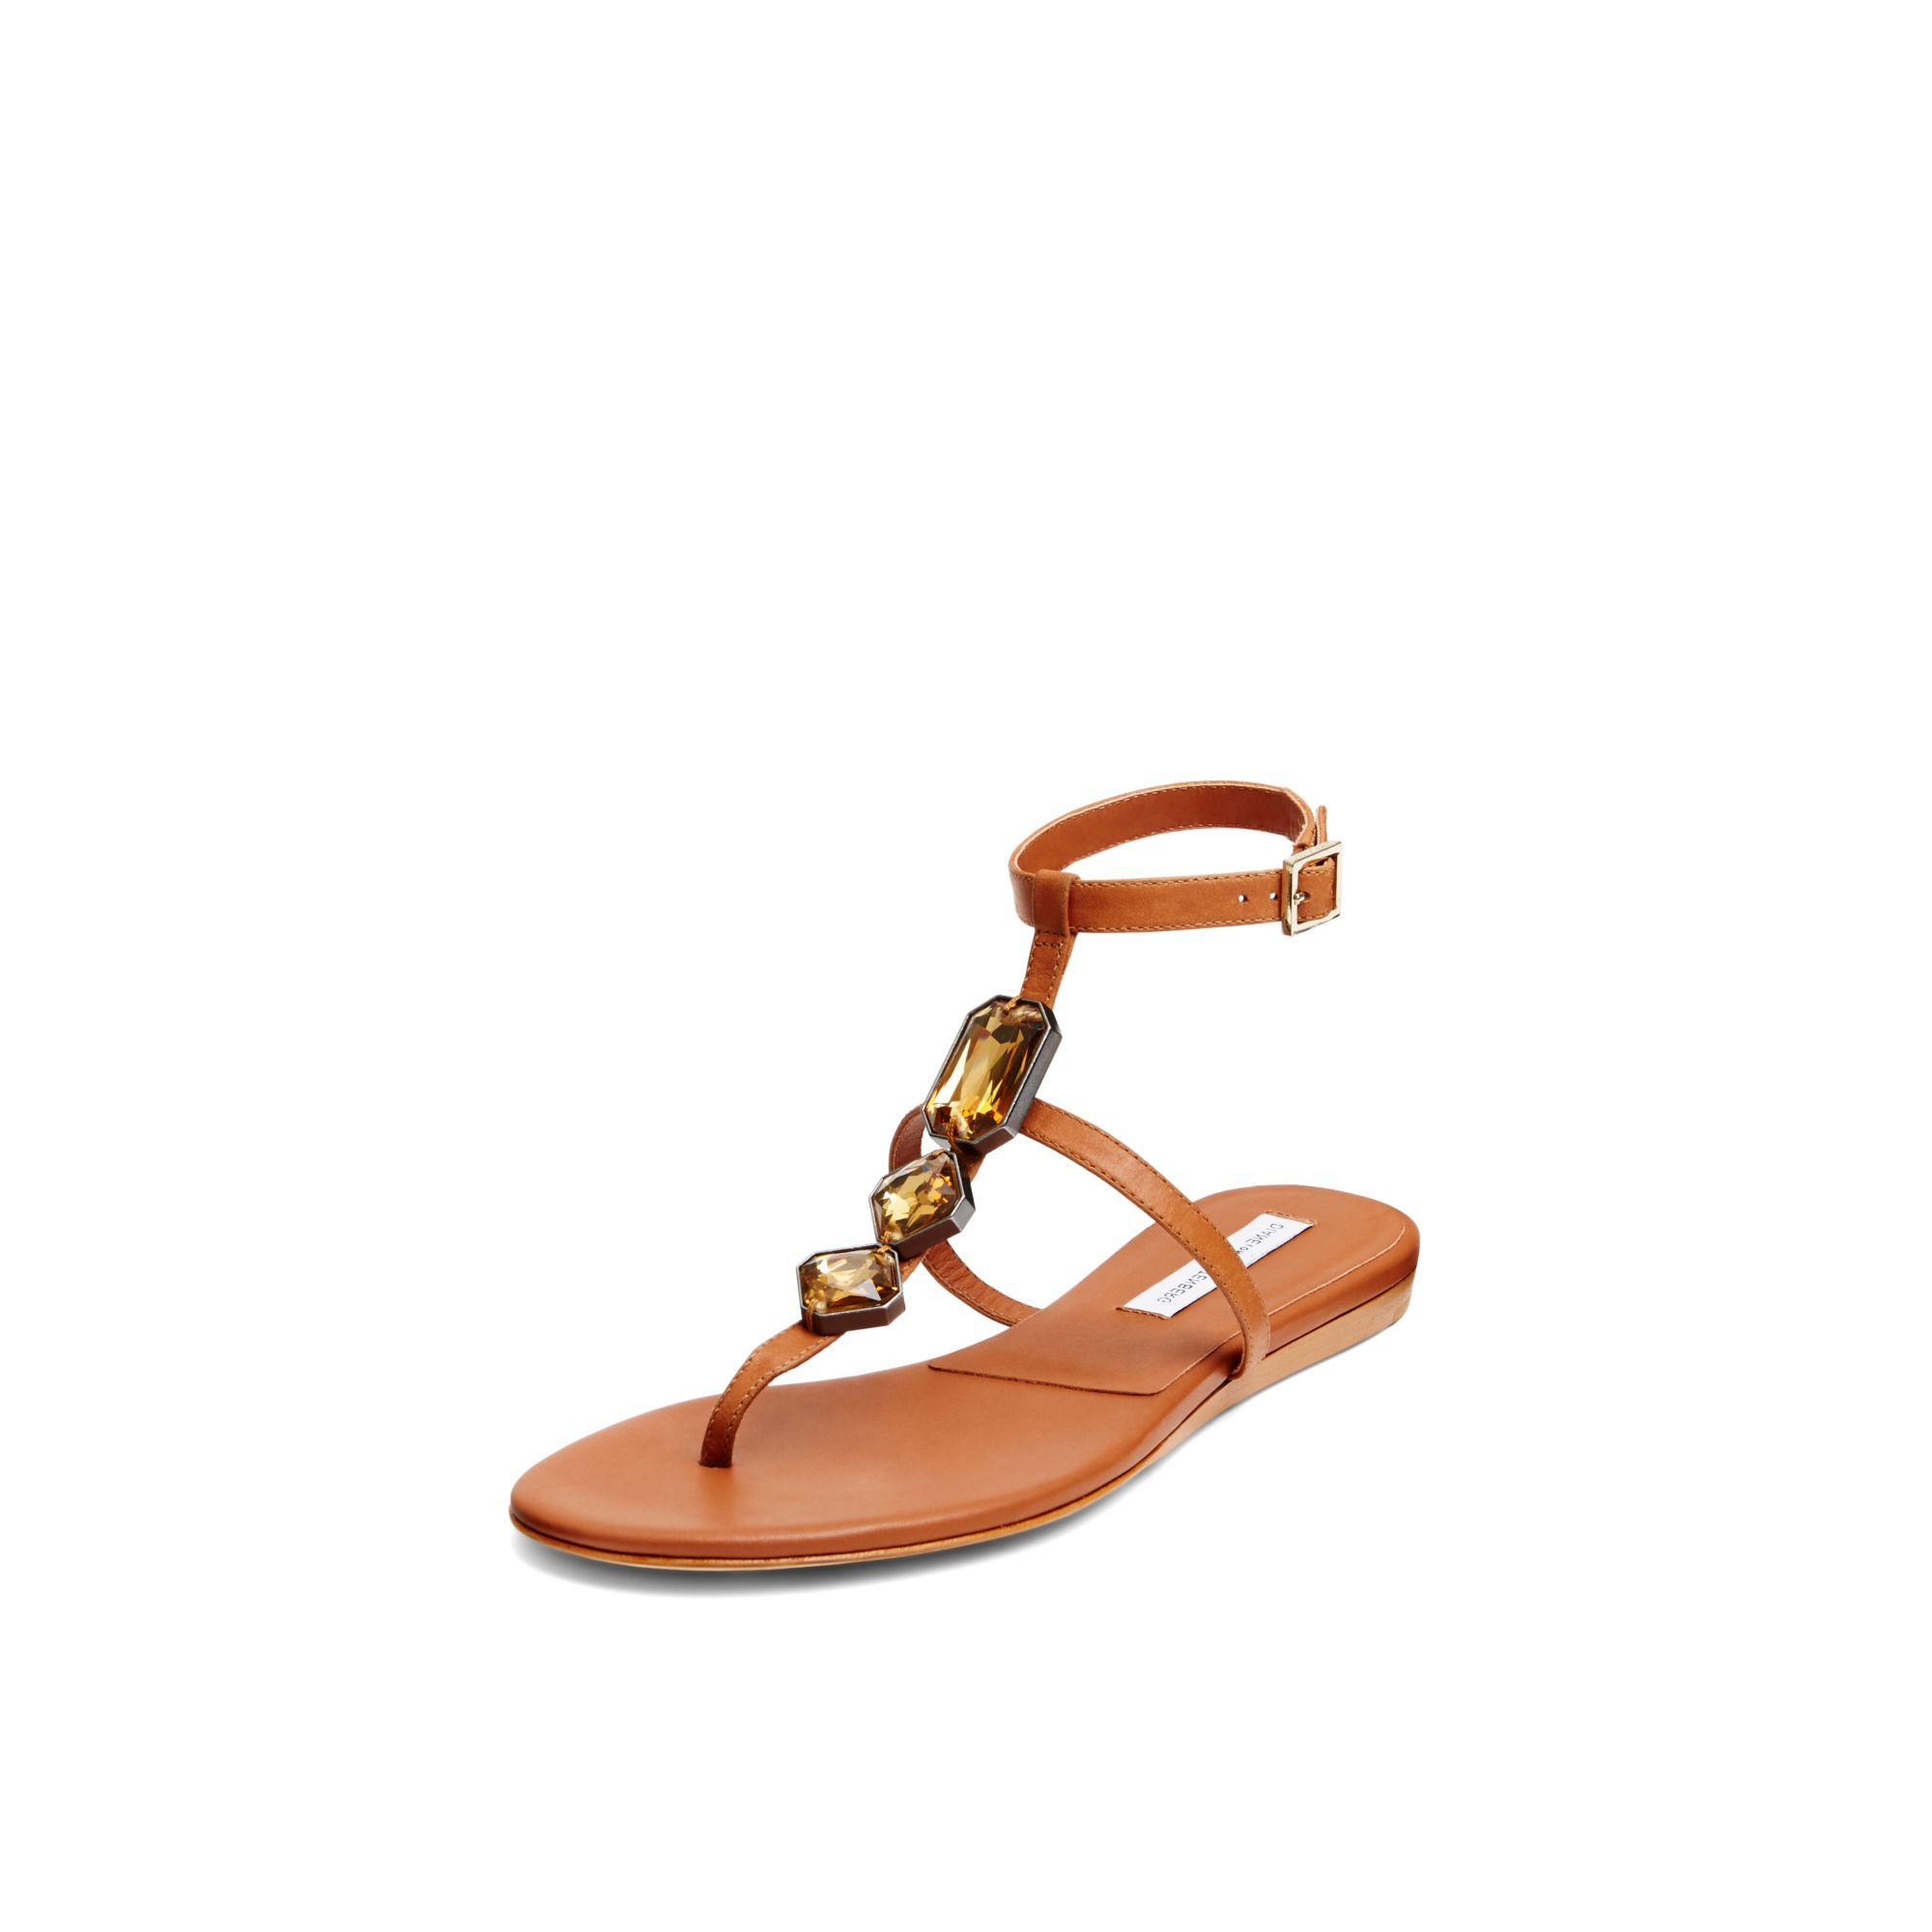 buy cheap exclusive Diane von Furstenberg Embellished Slingback Sandals buy cheap enjoy nRJh2N7